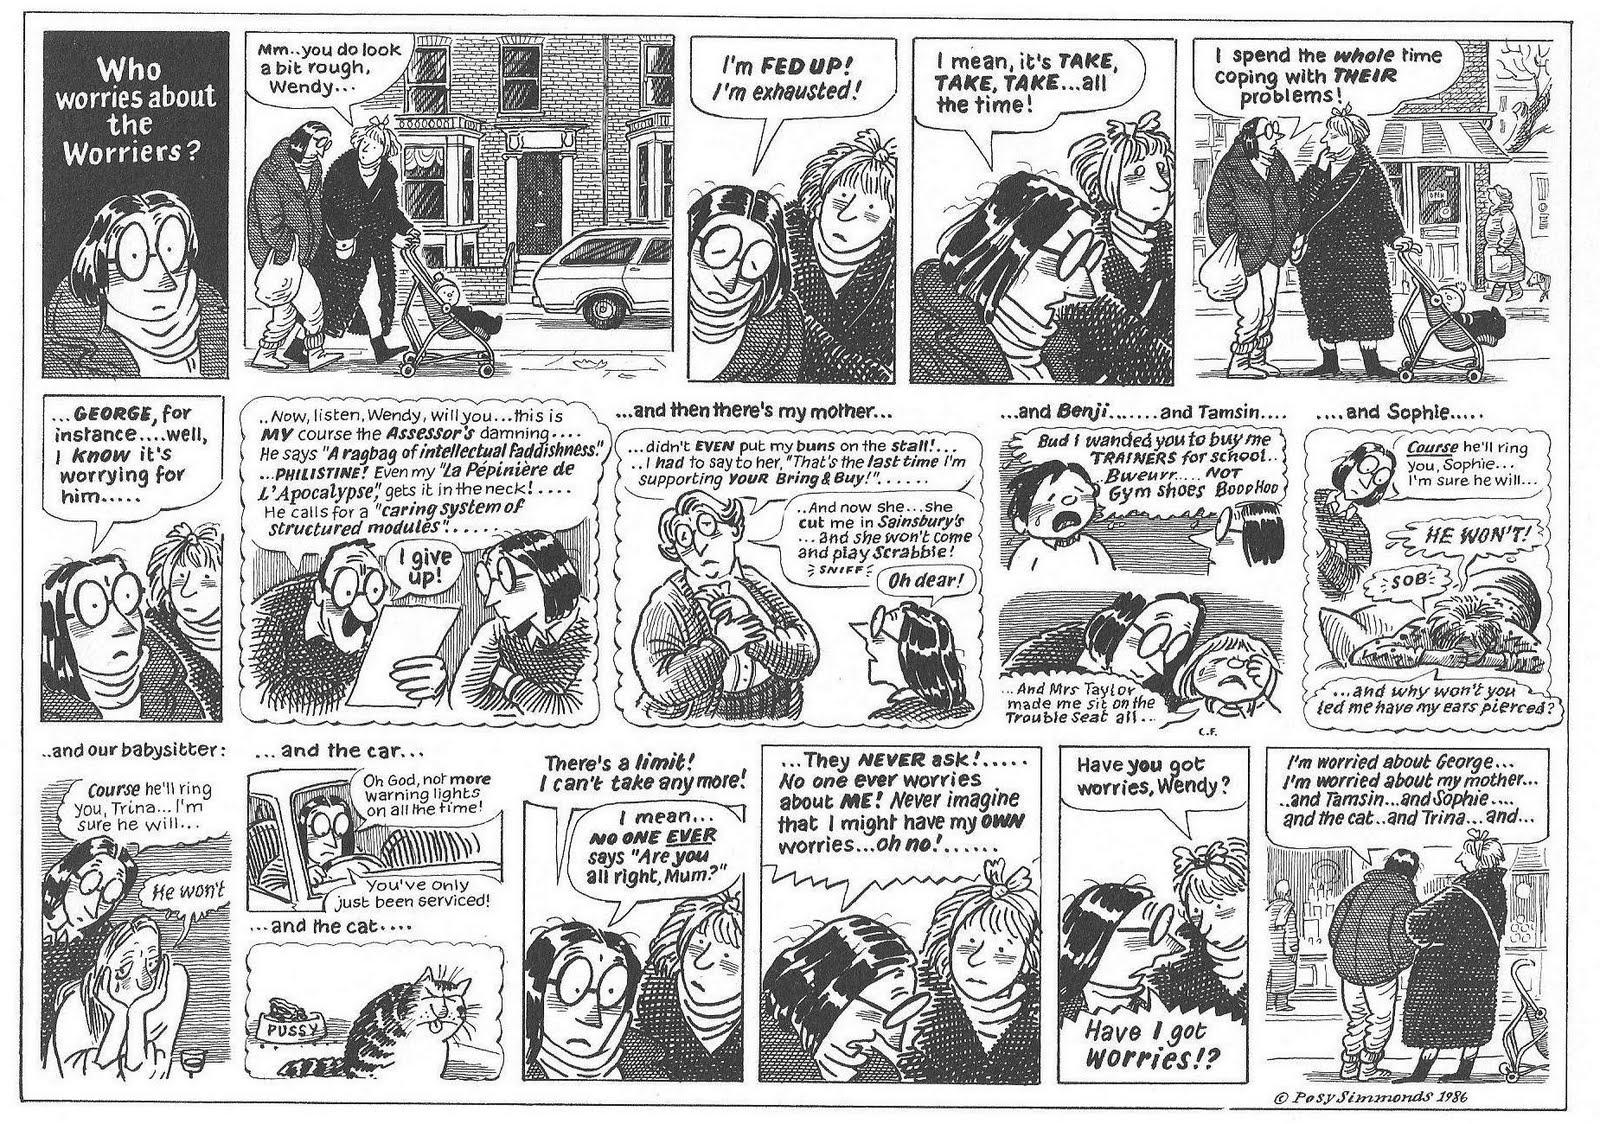 Posy Simmonds Sunday Comics Debt Posy Simmonds